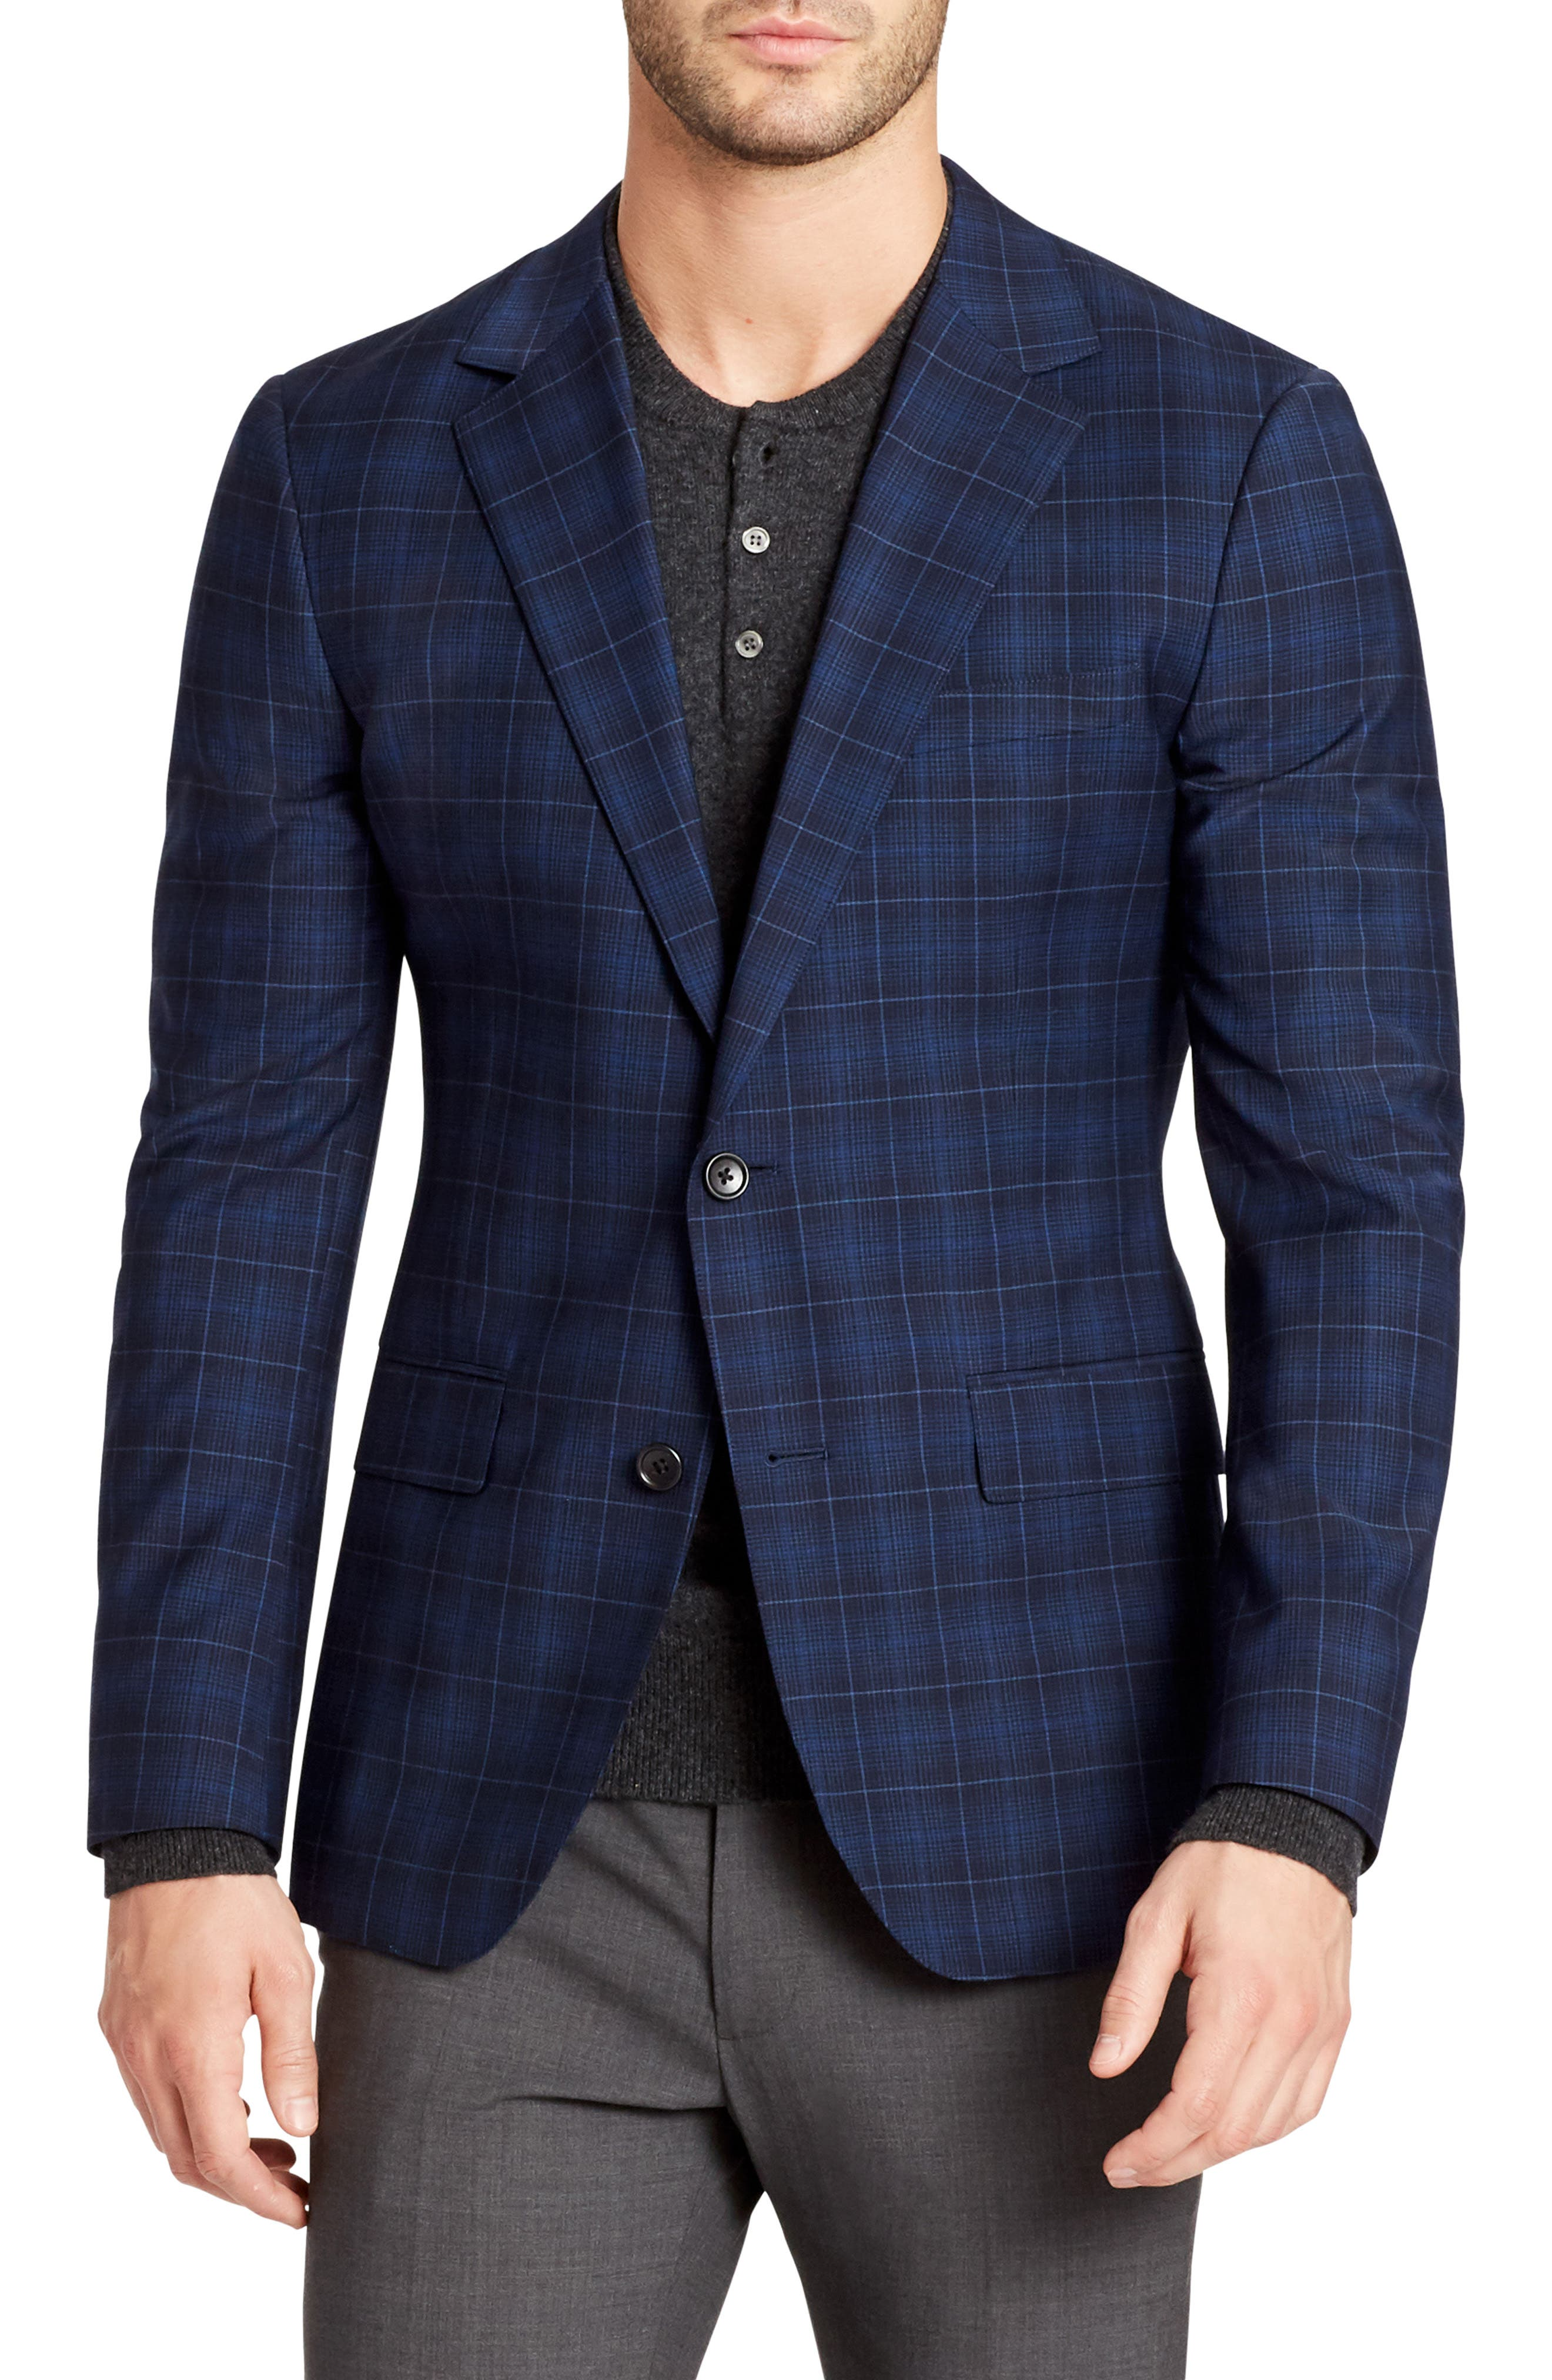 Jetsetter Slim Fit Plaid Wool Sport Coat,                             Main thumbnail 1, color,                             400